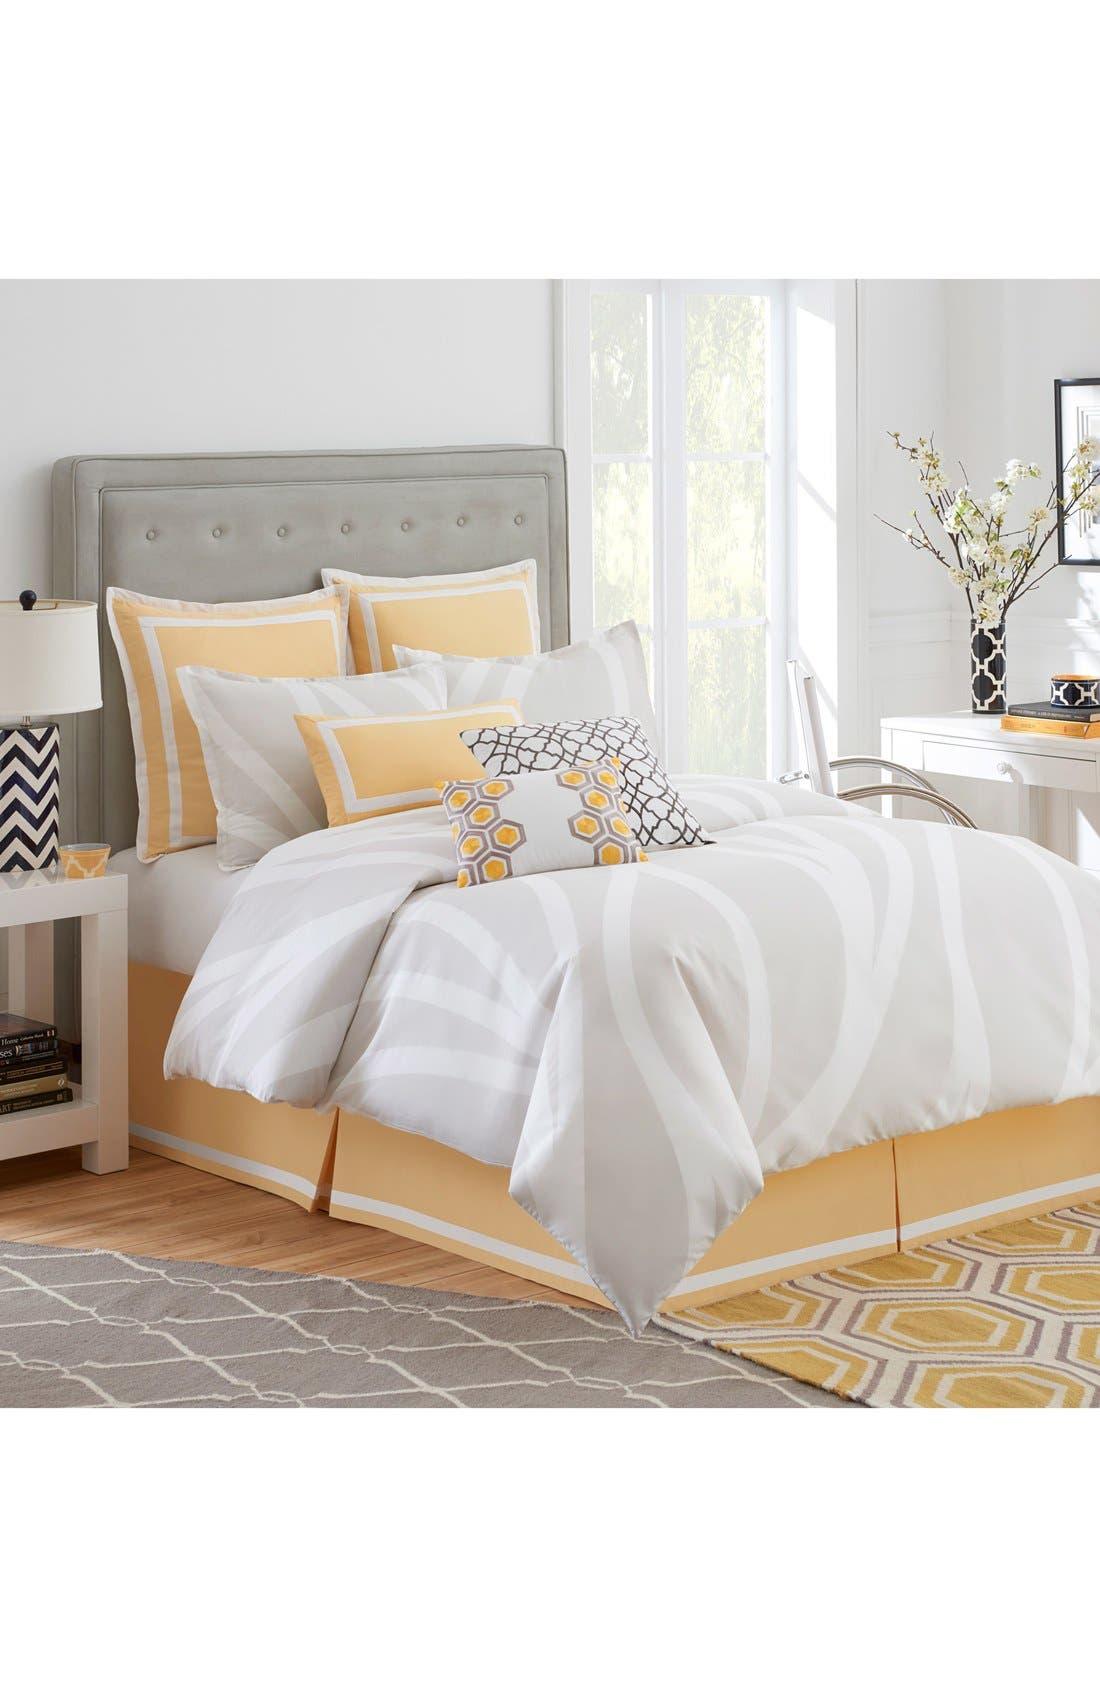 Jill Rosenwald 'Groton Swirl' Comforter